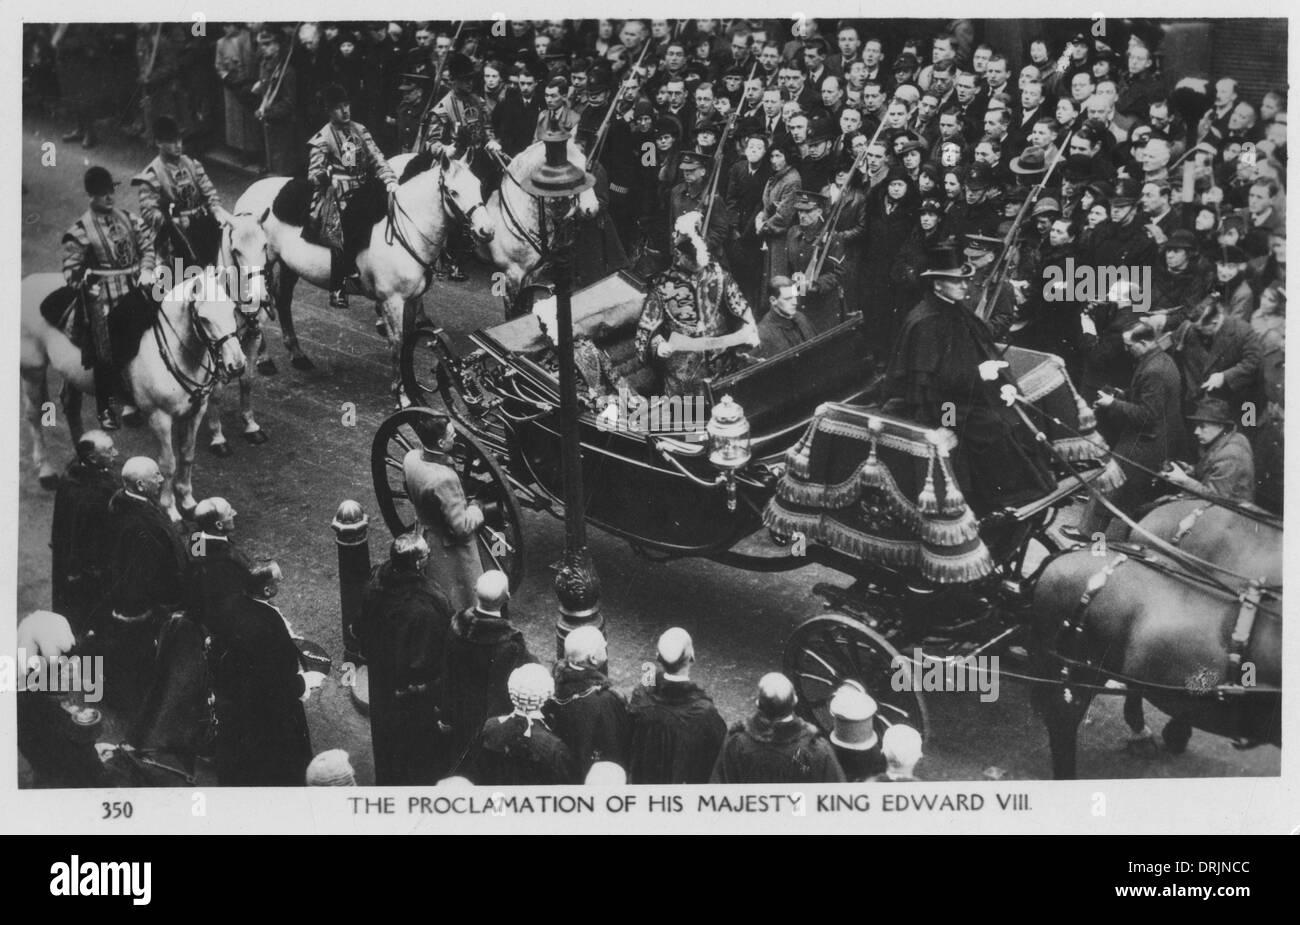 The proclamation of his Majesty King Edward VIII. - Stock Image